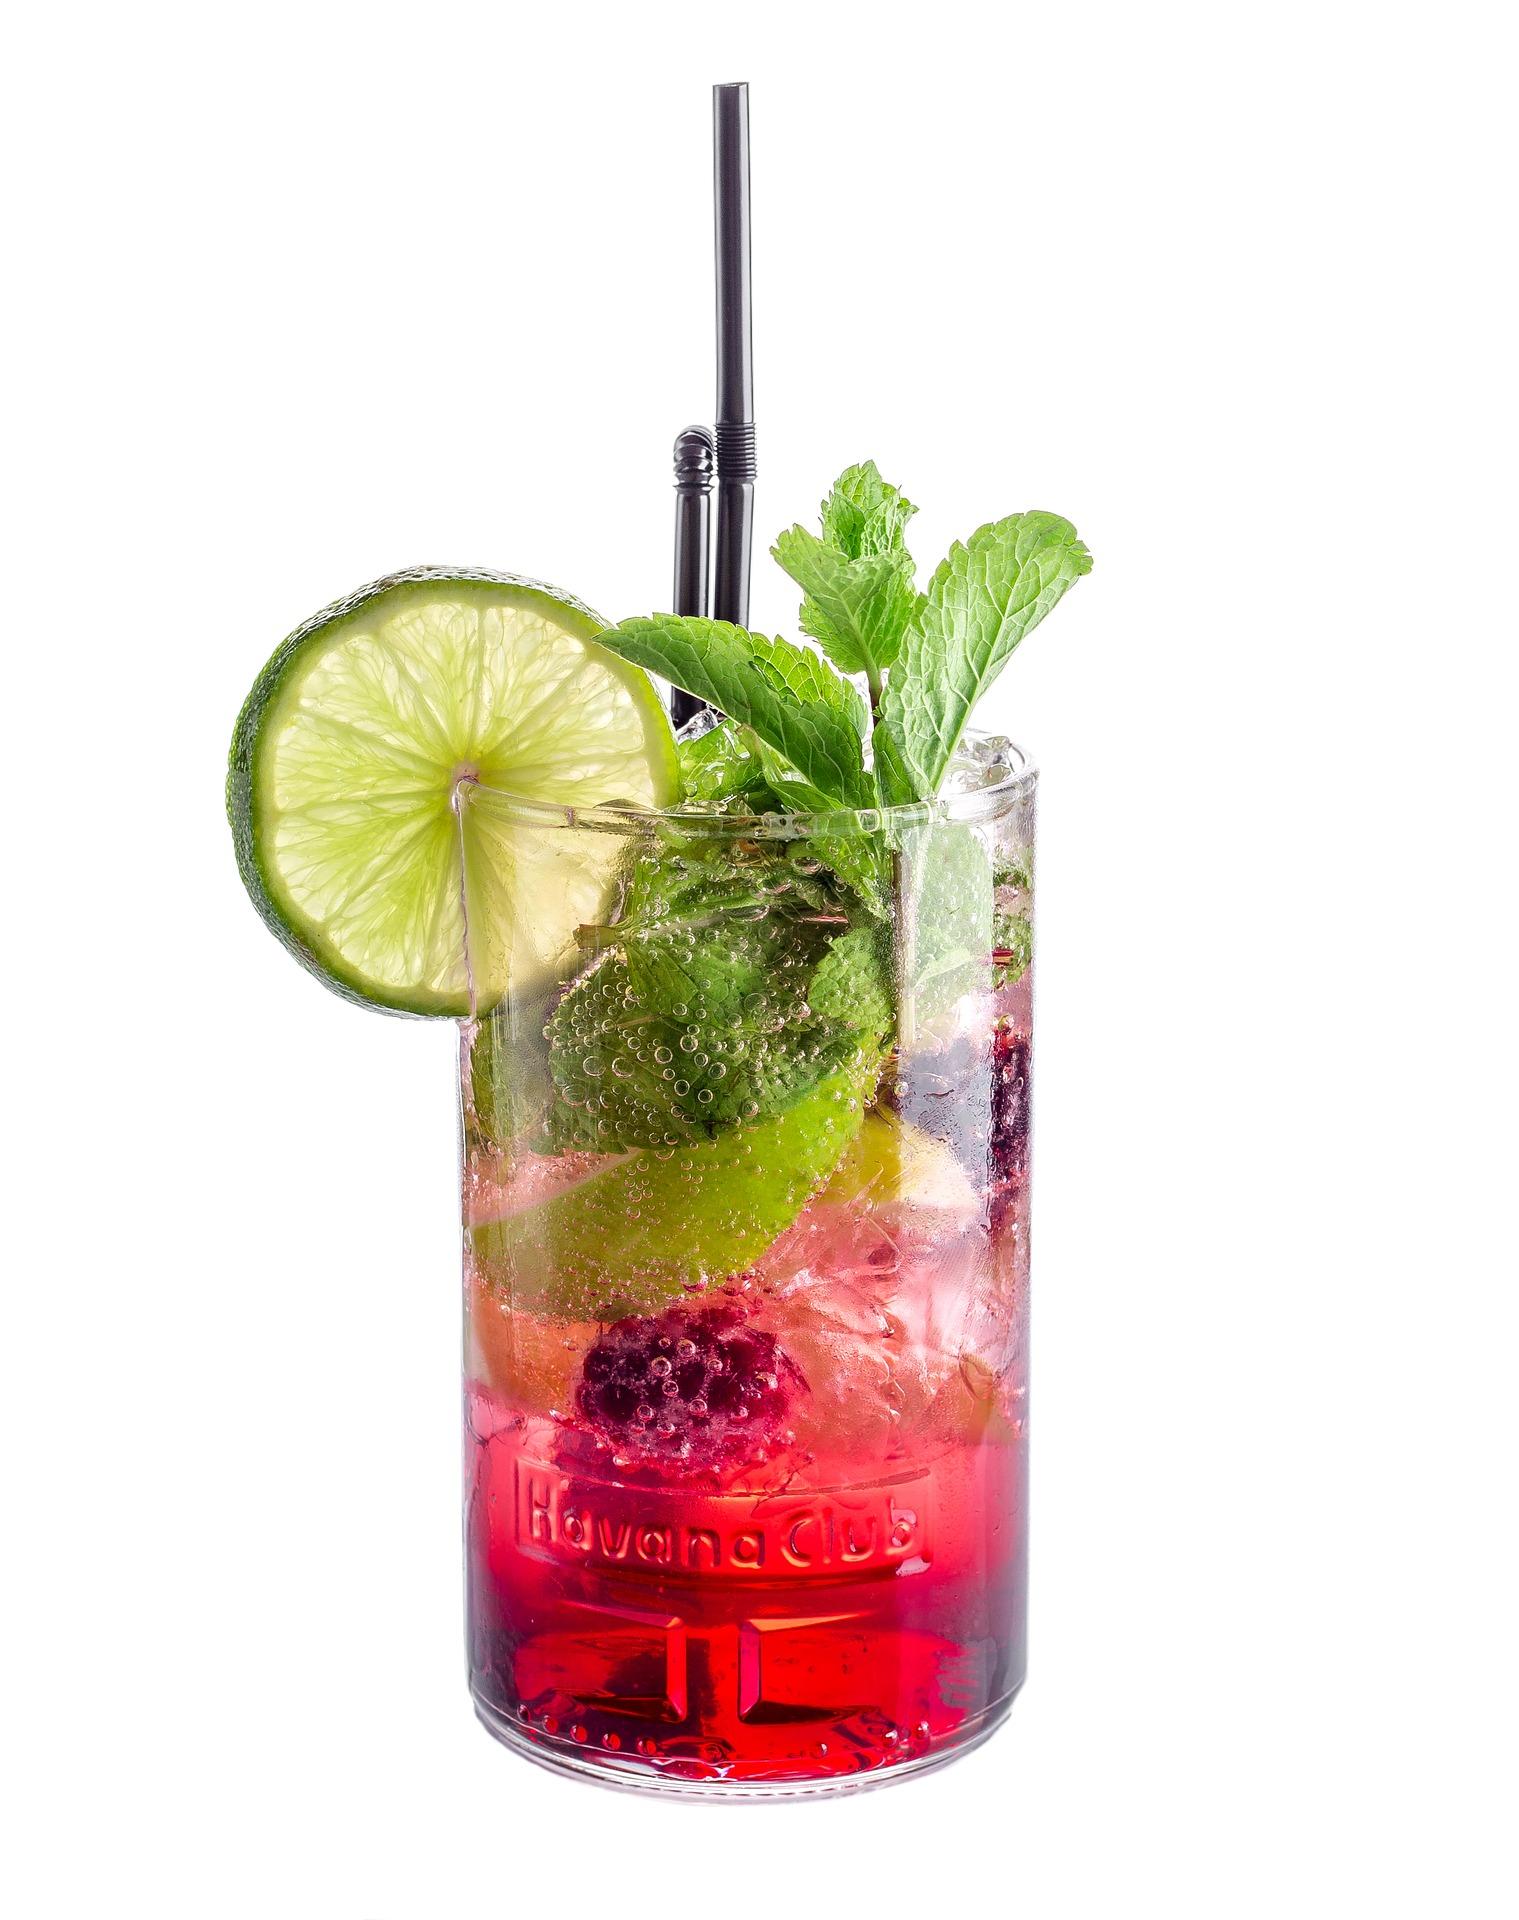 cocktail-1971488_1920.jpg